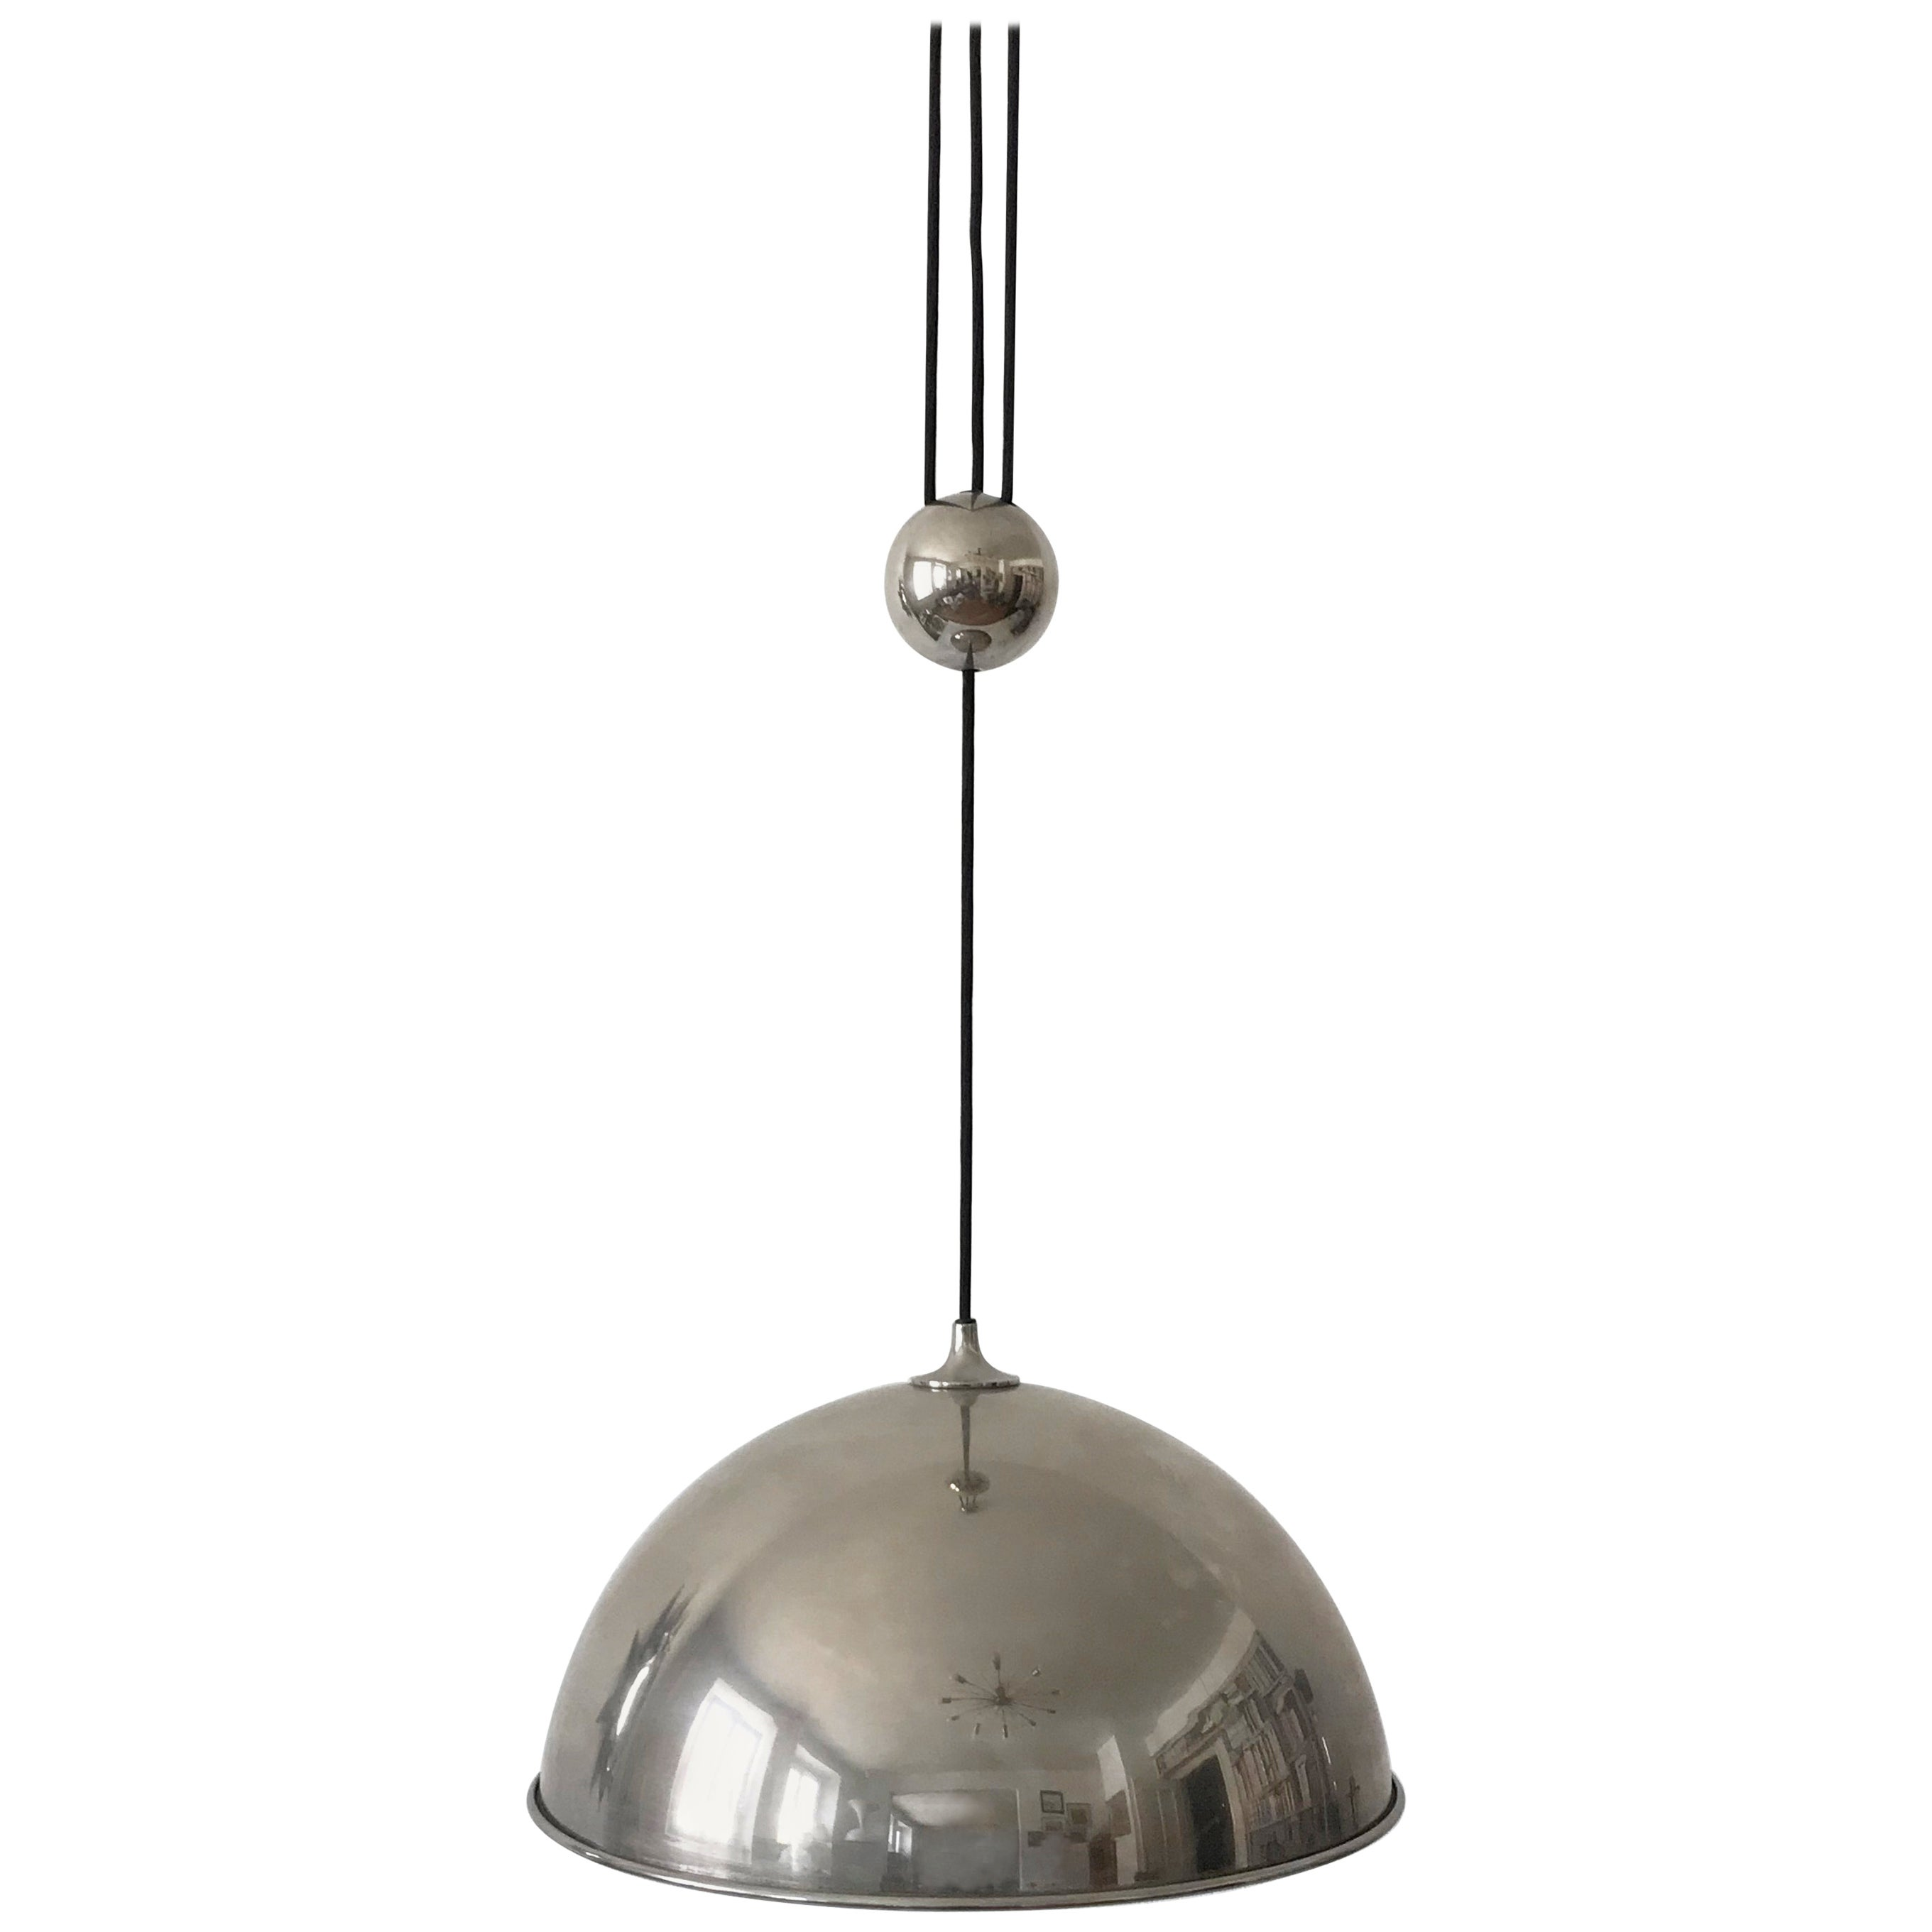 Elegant Counter Balance Pendant Lamp by Florian Schulz, Germany, 1980s